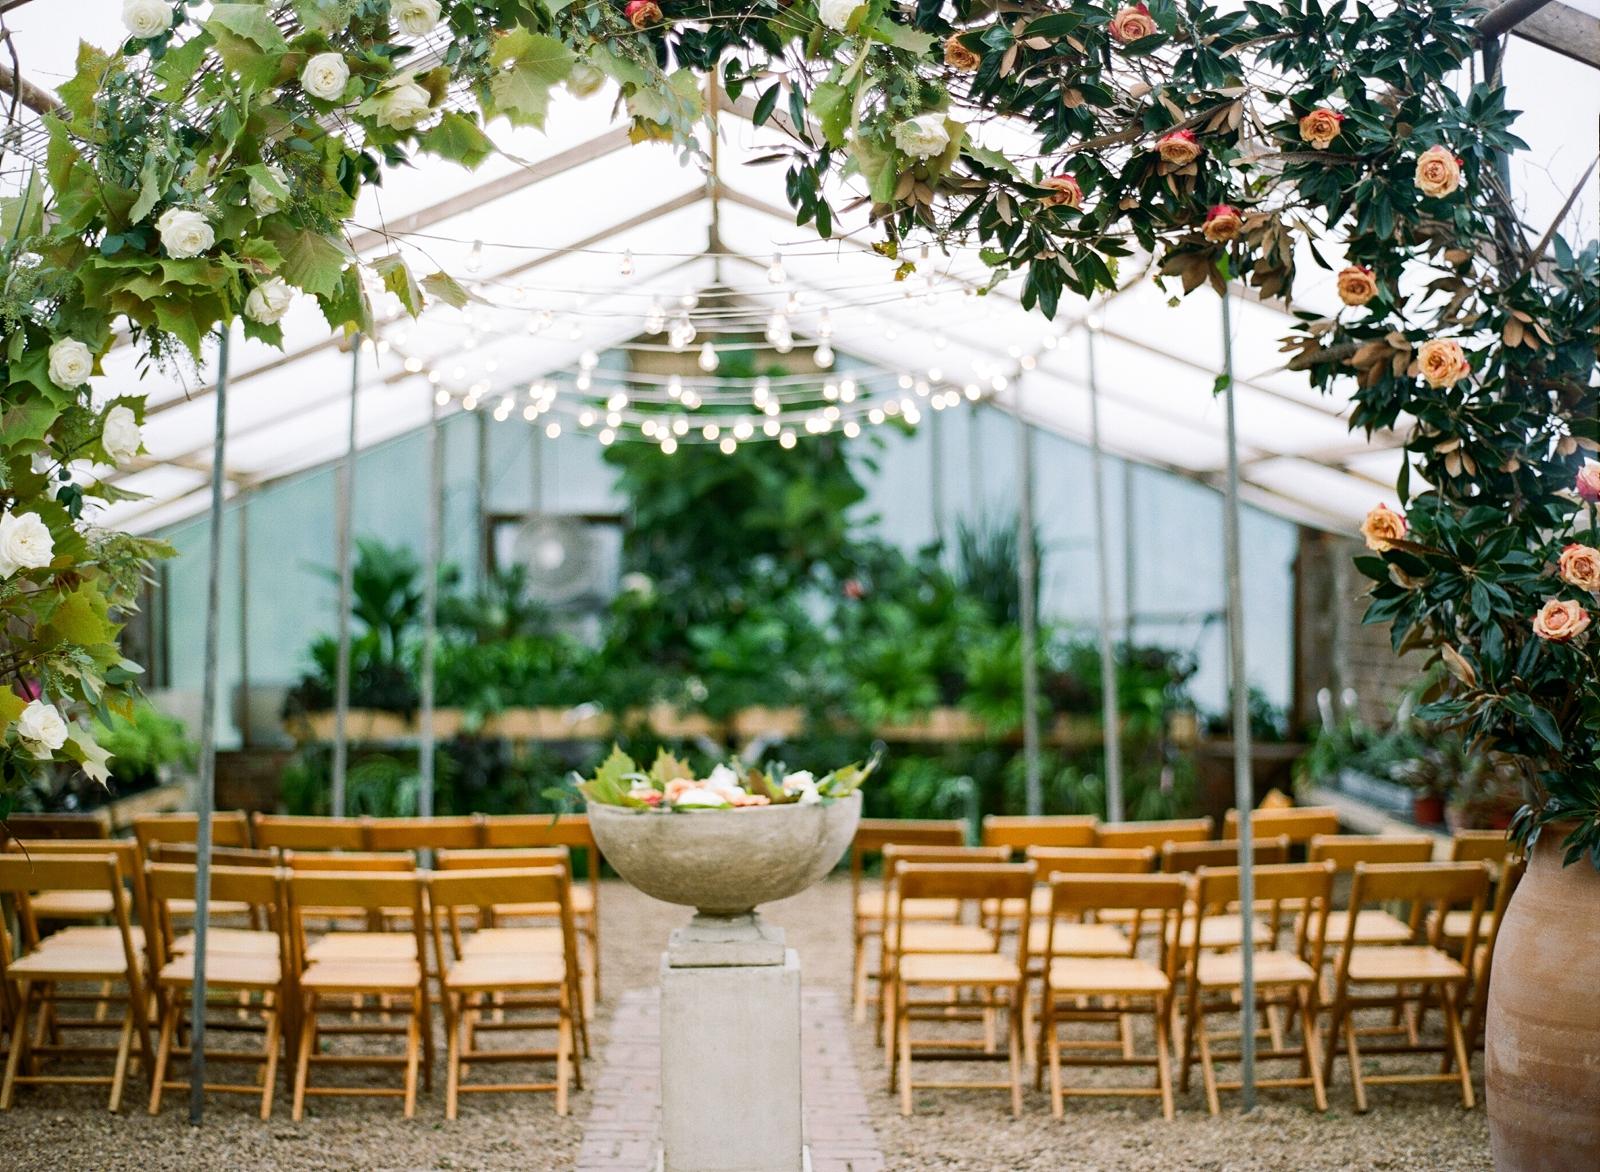 tallahassee greenhouse wedding purple martin outpost tallahassee florida shannon griffin_0038.jpg